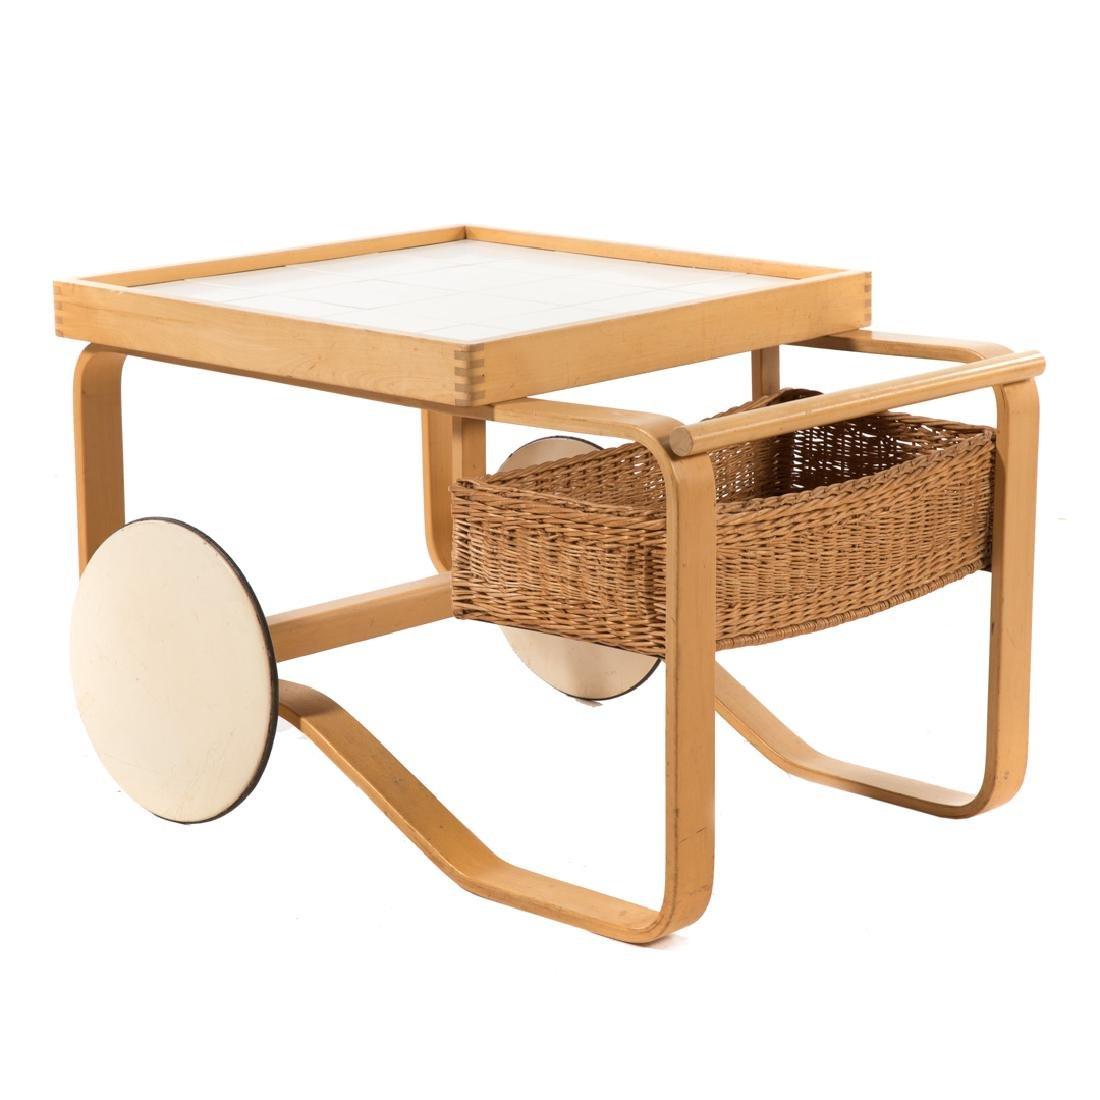 Alvar Aalto tea trolley by Artek